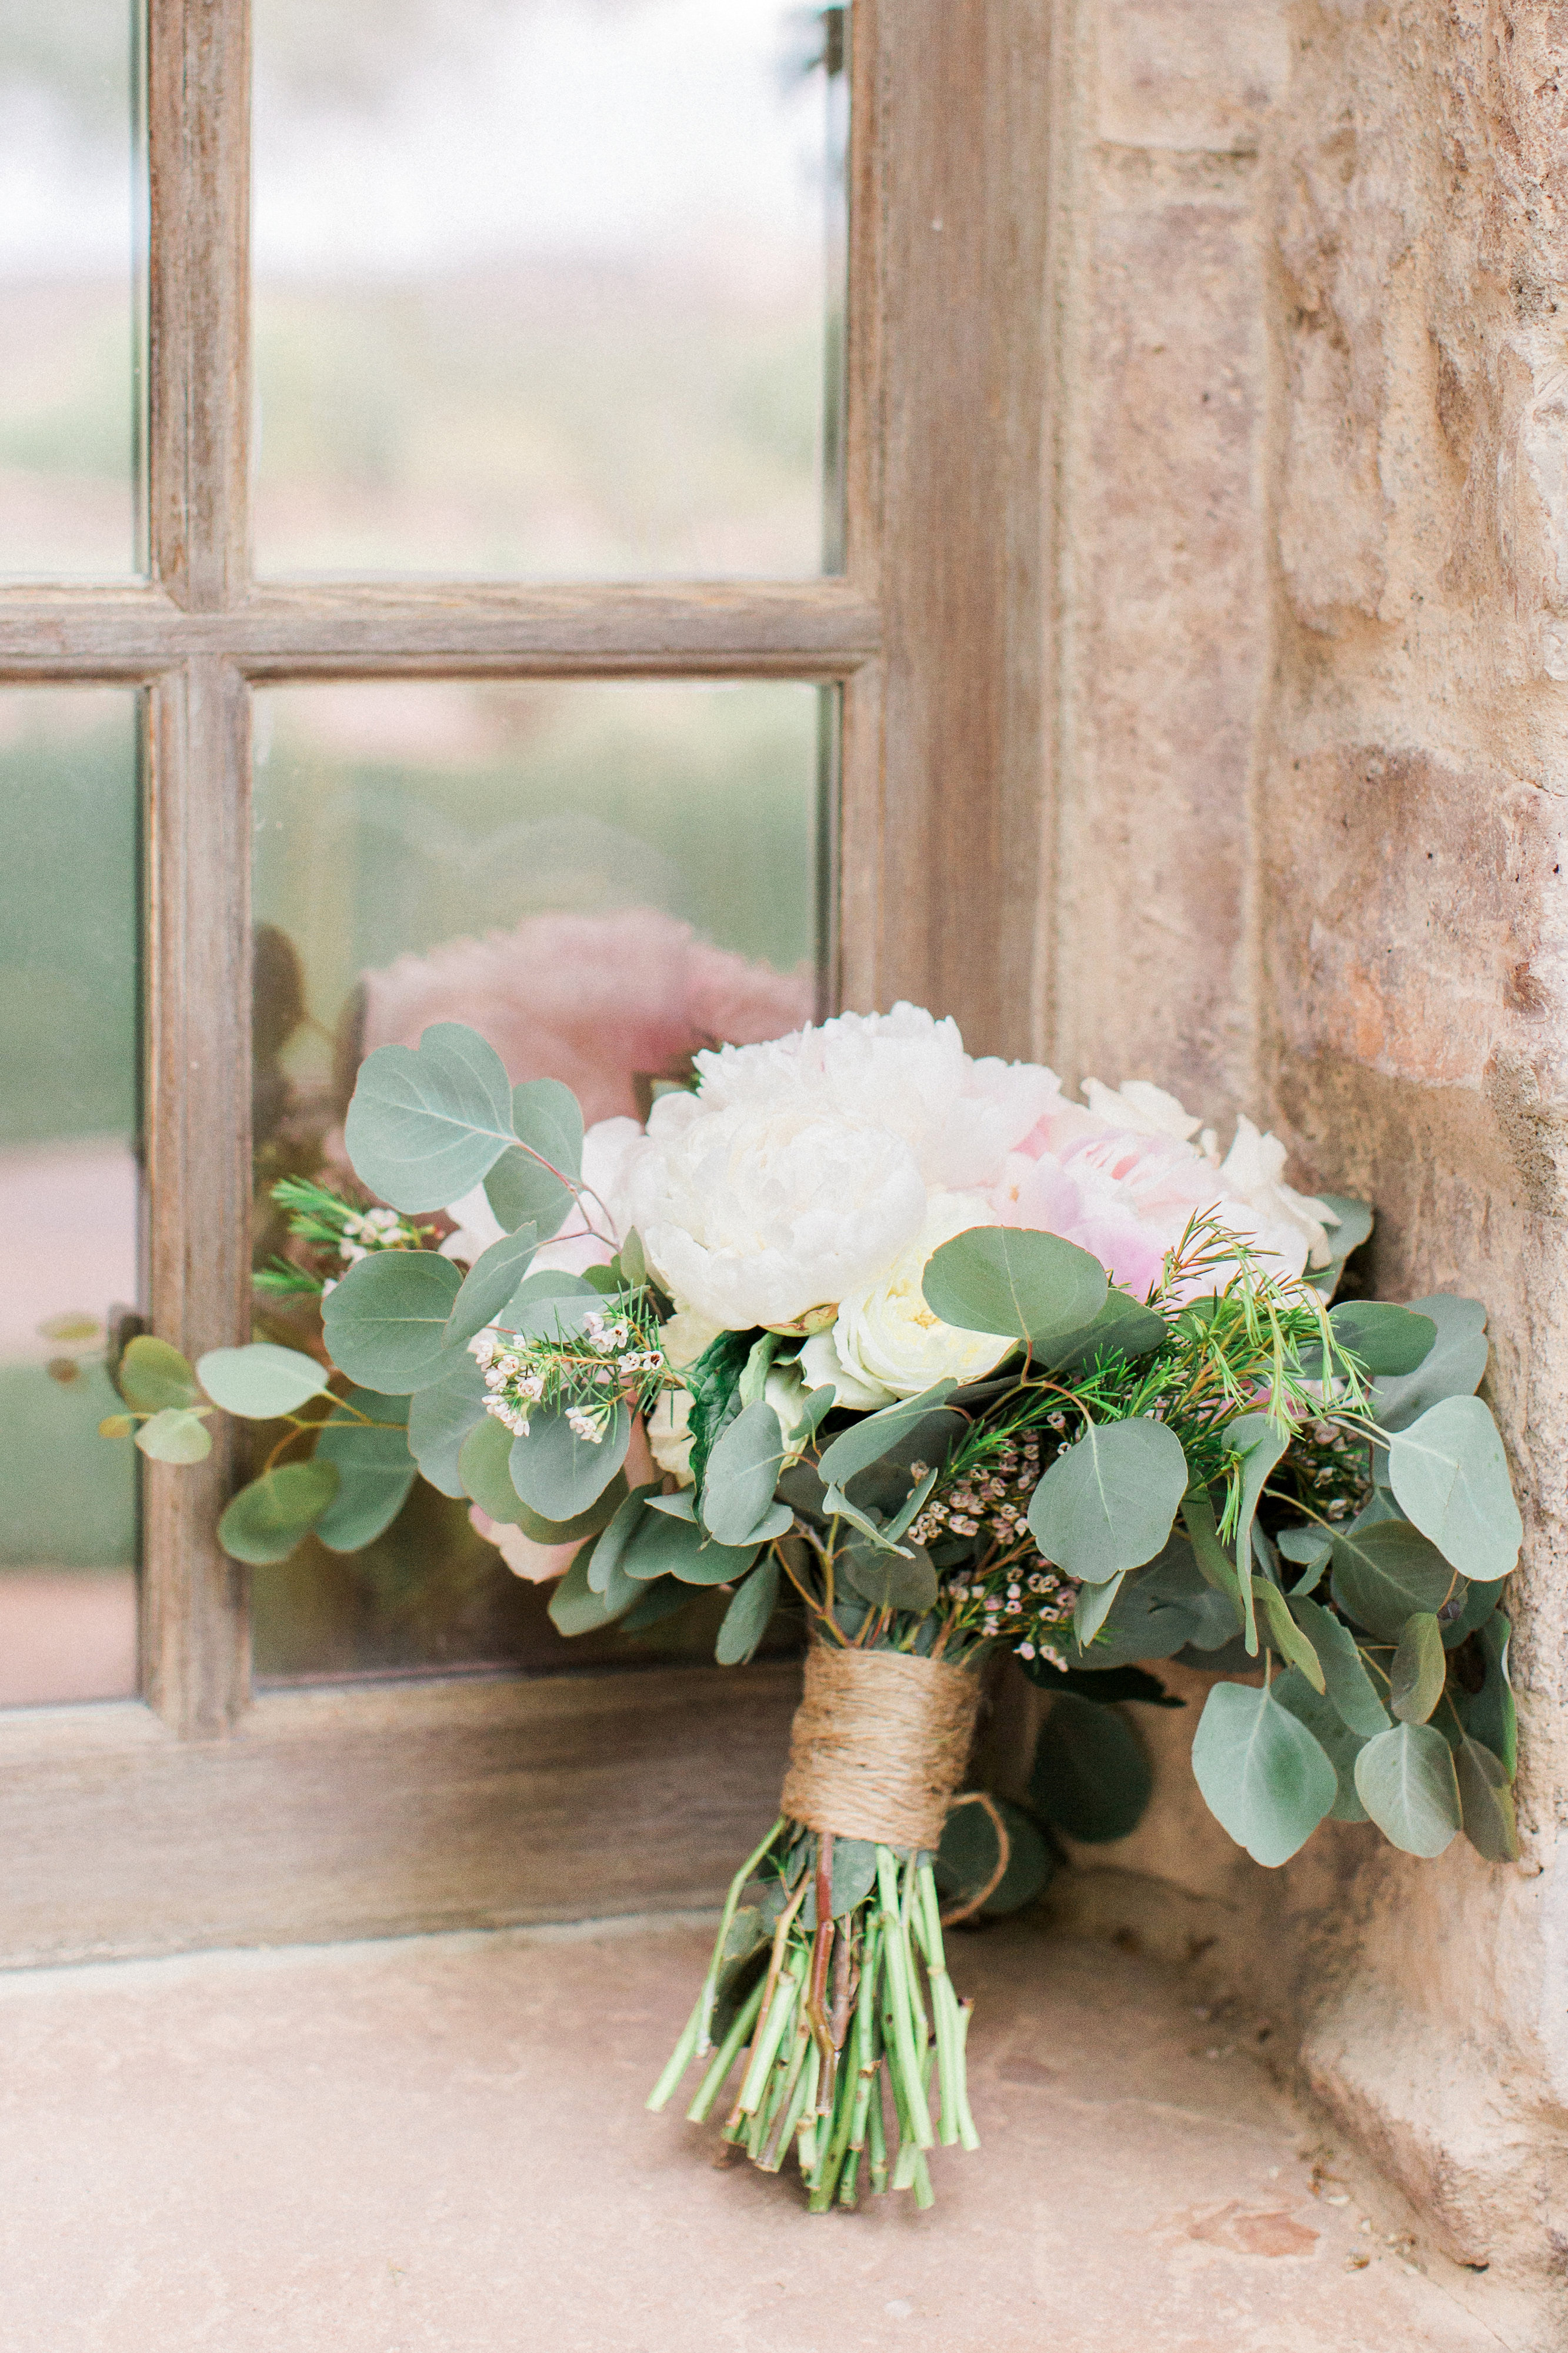 bouquet wraps flowers twine resting against window